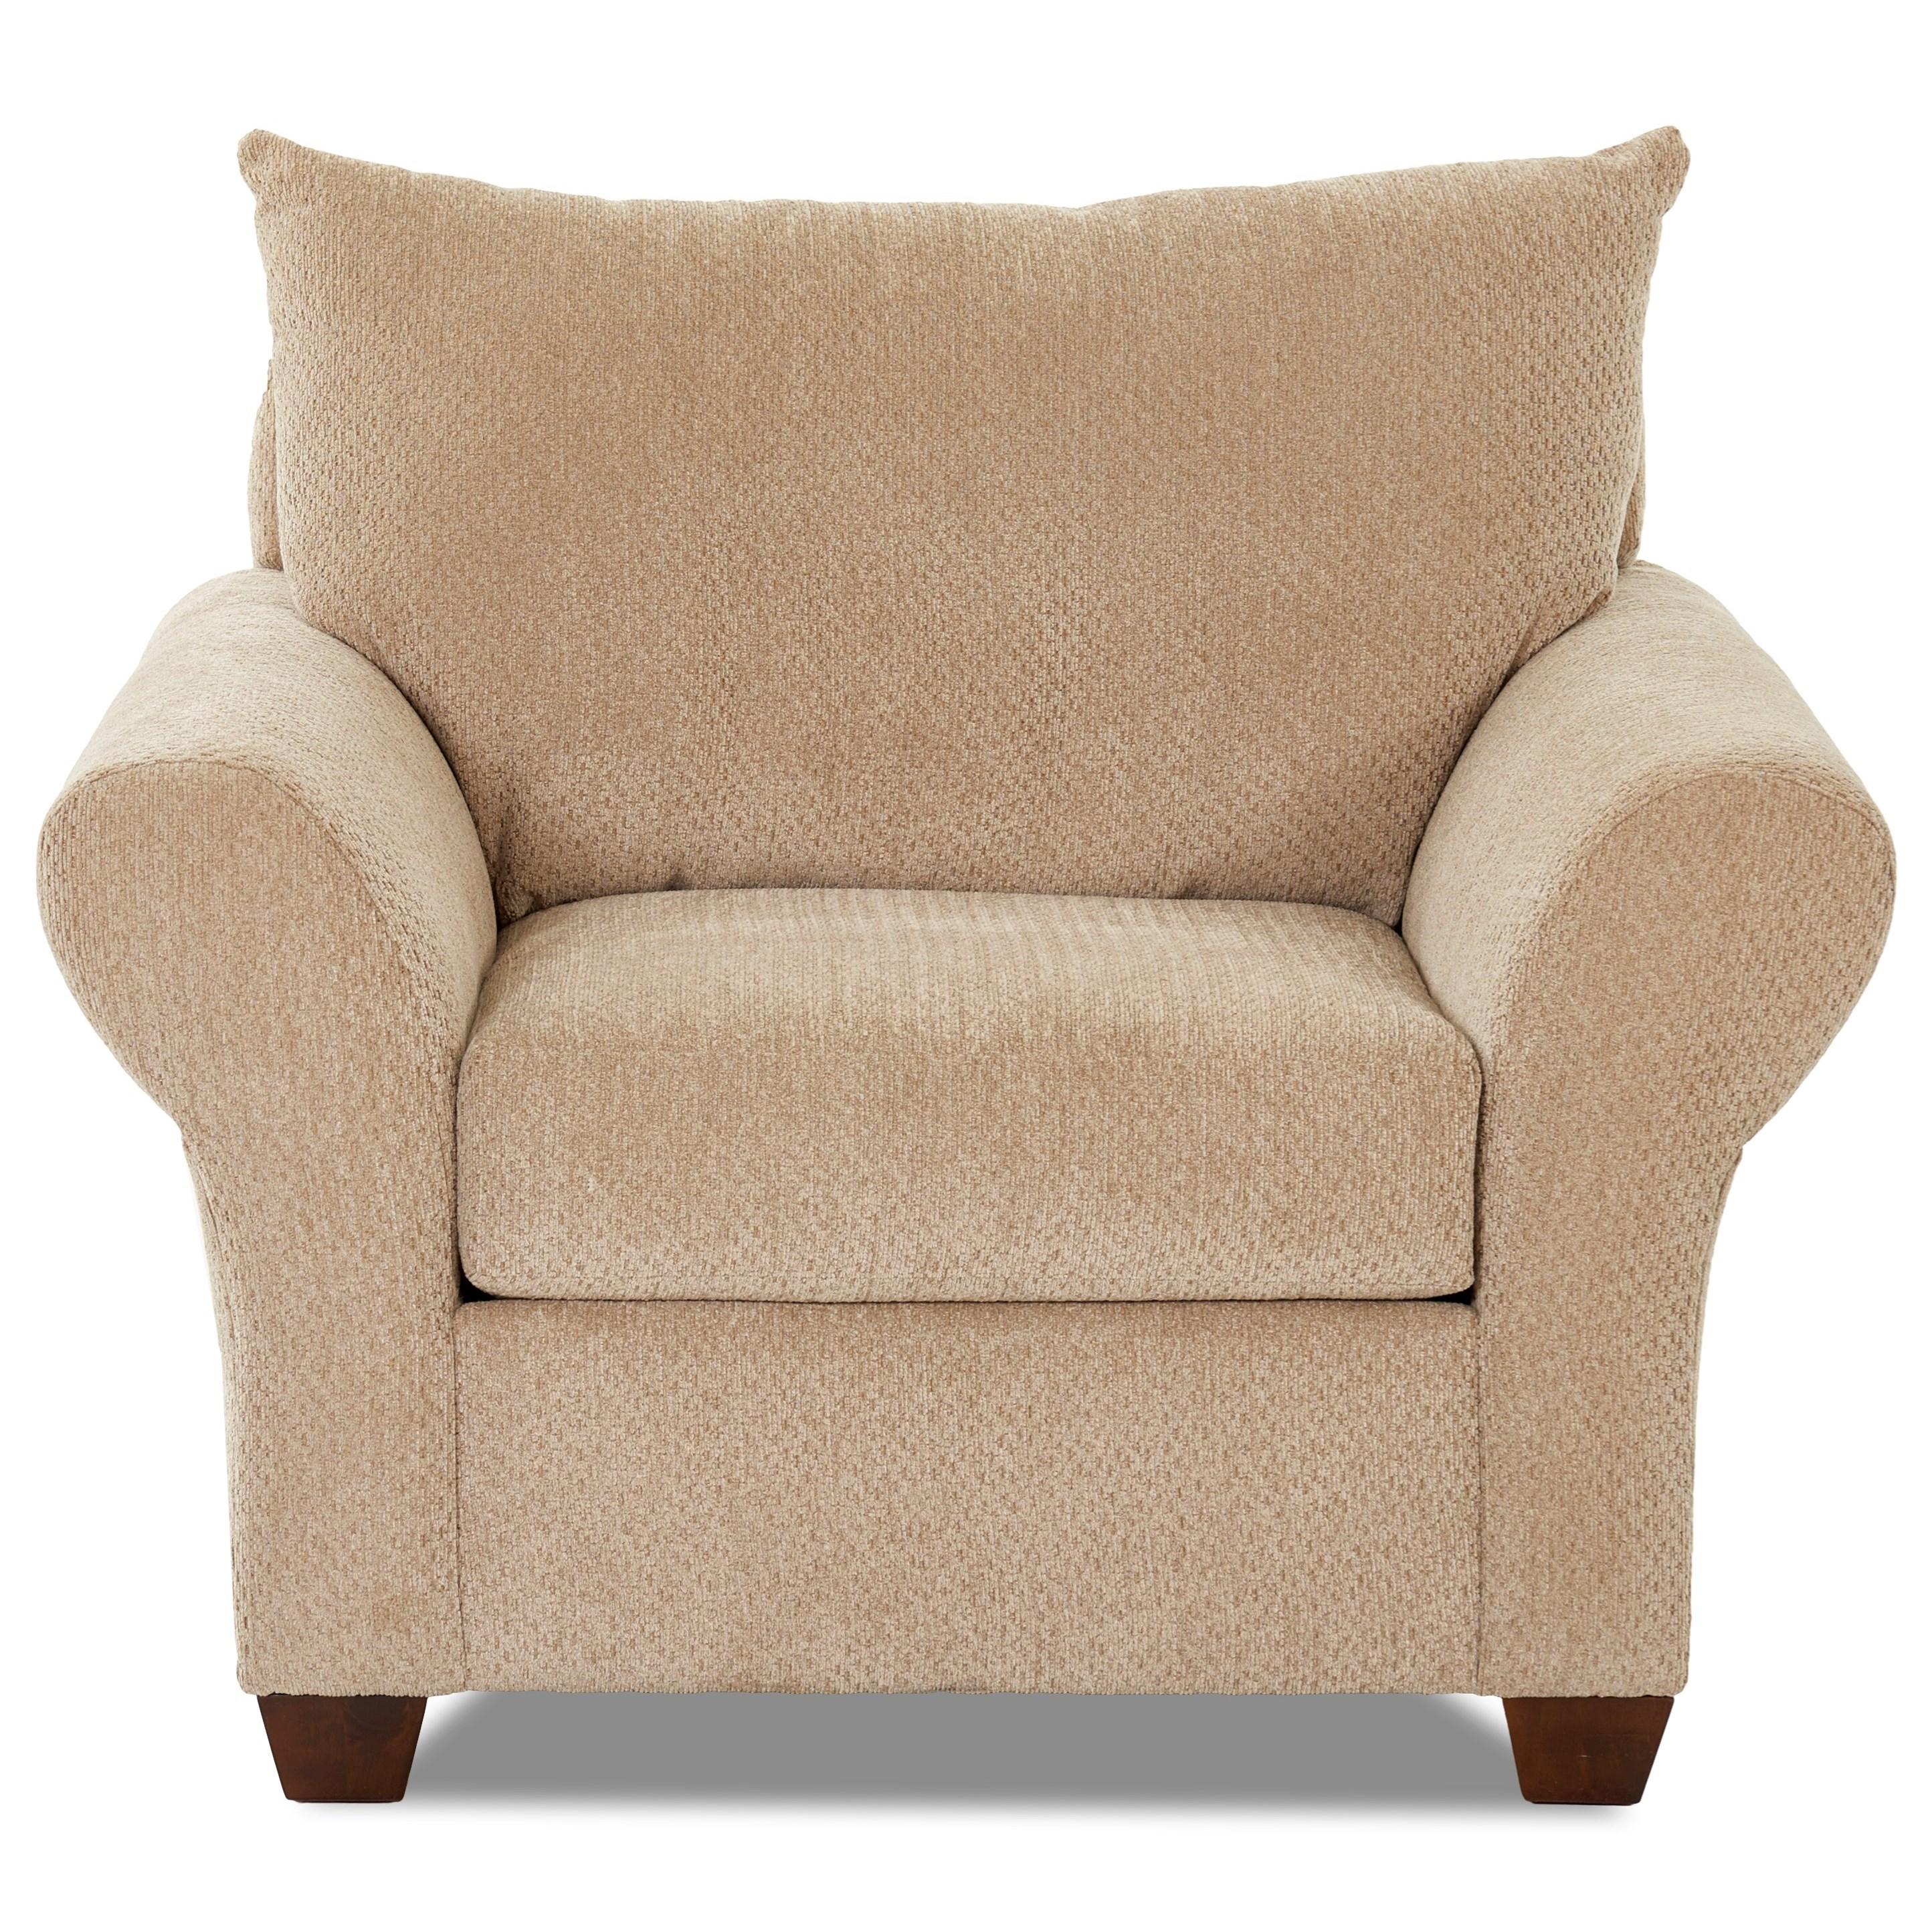 Klaussner Cedar Creek Chair - Item Number: K16300 C-Chunky Putty